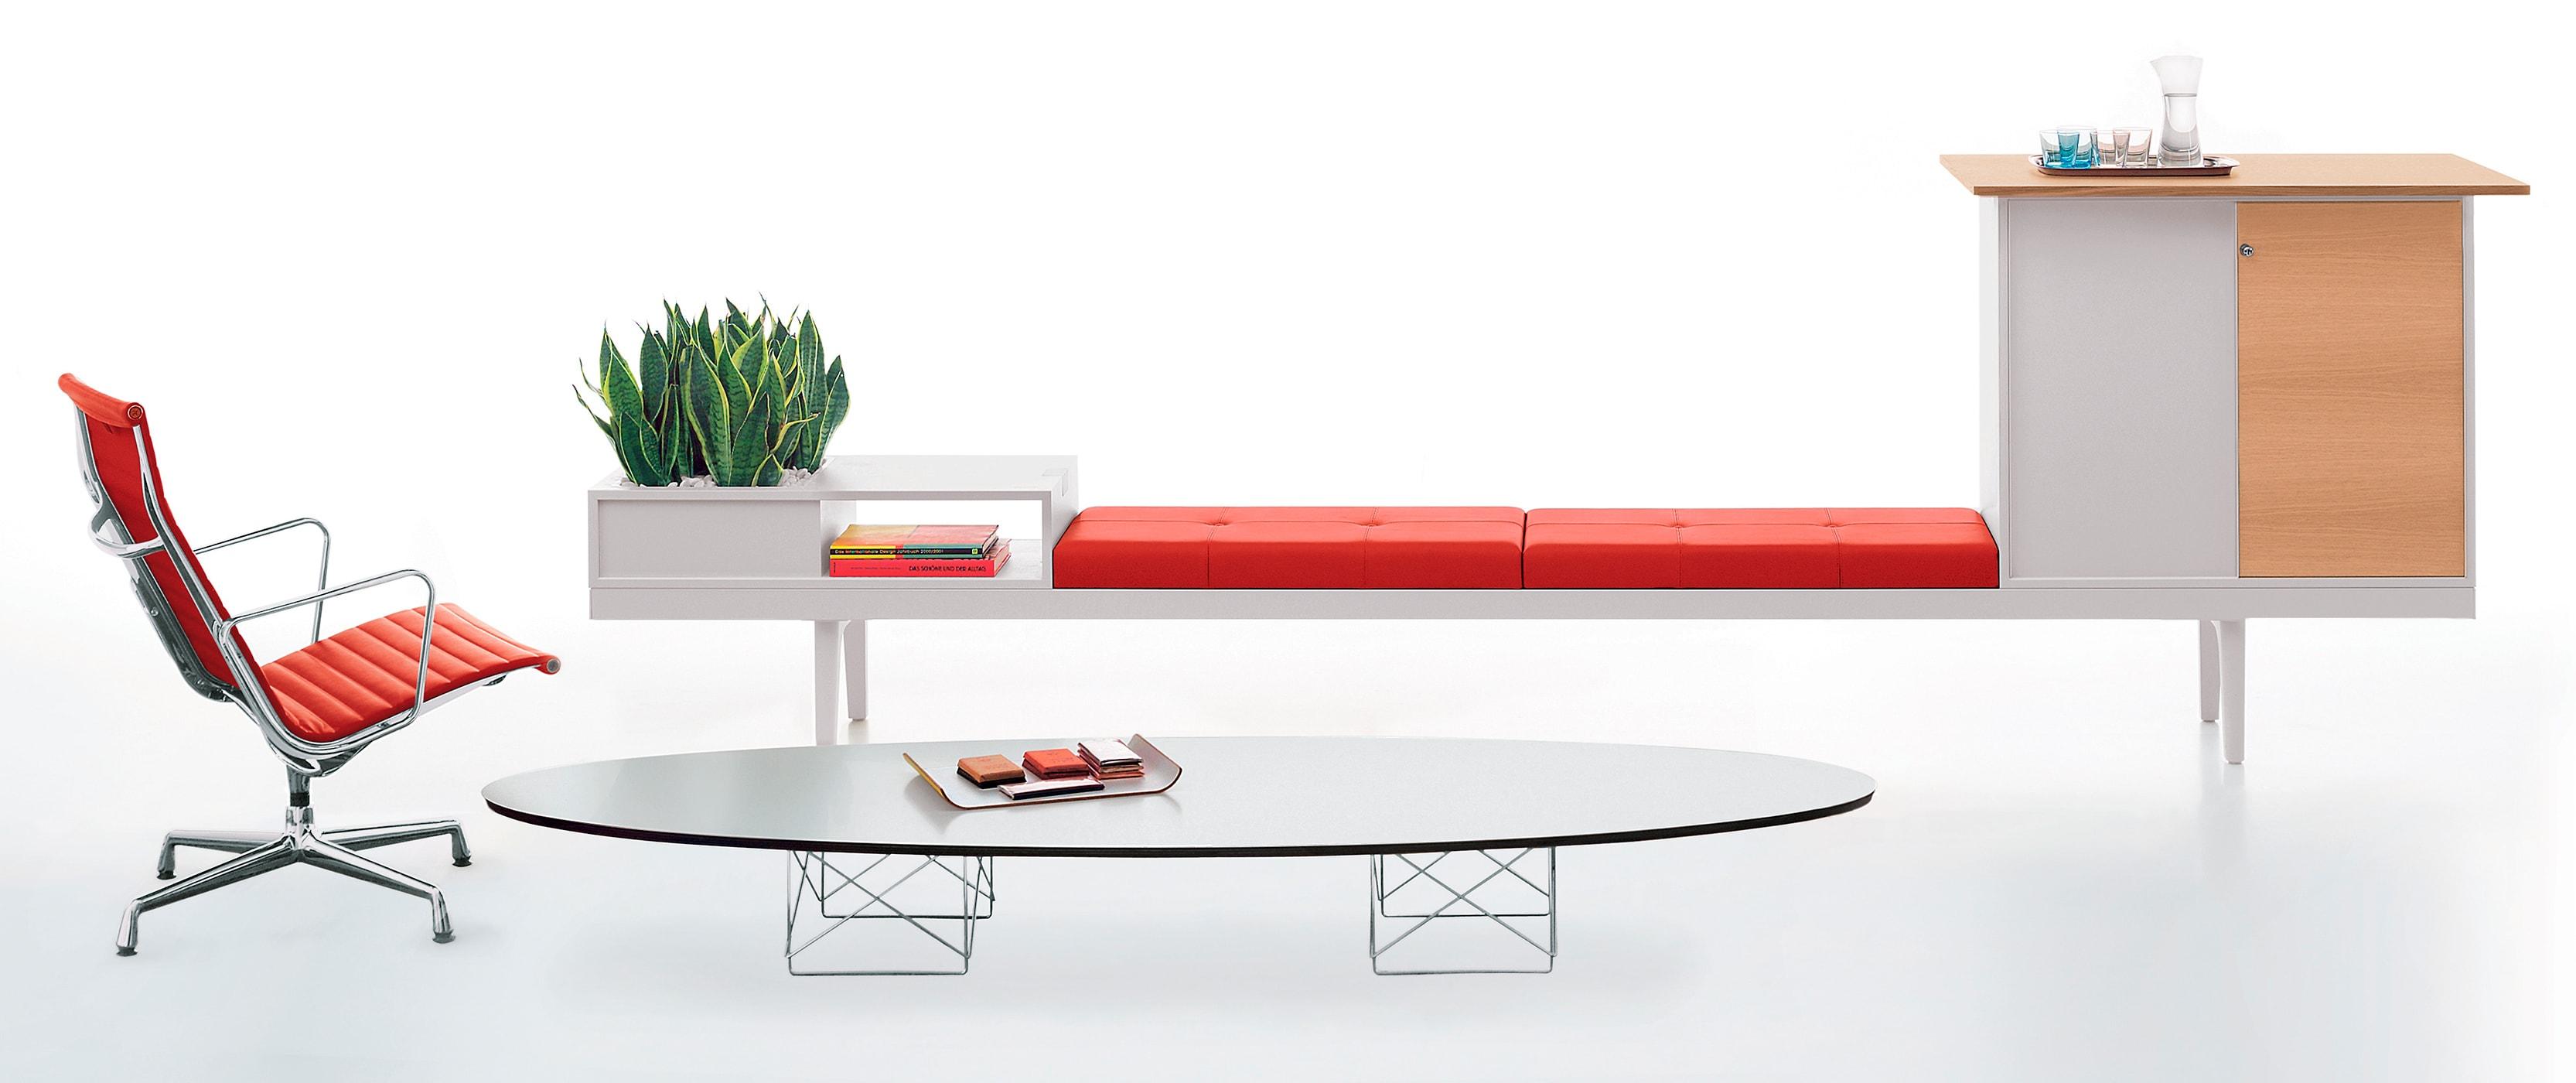 Elliptical ETR tavolino Vitra